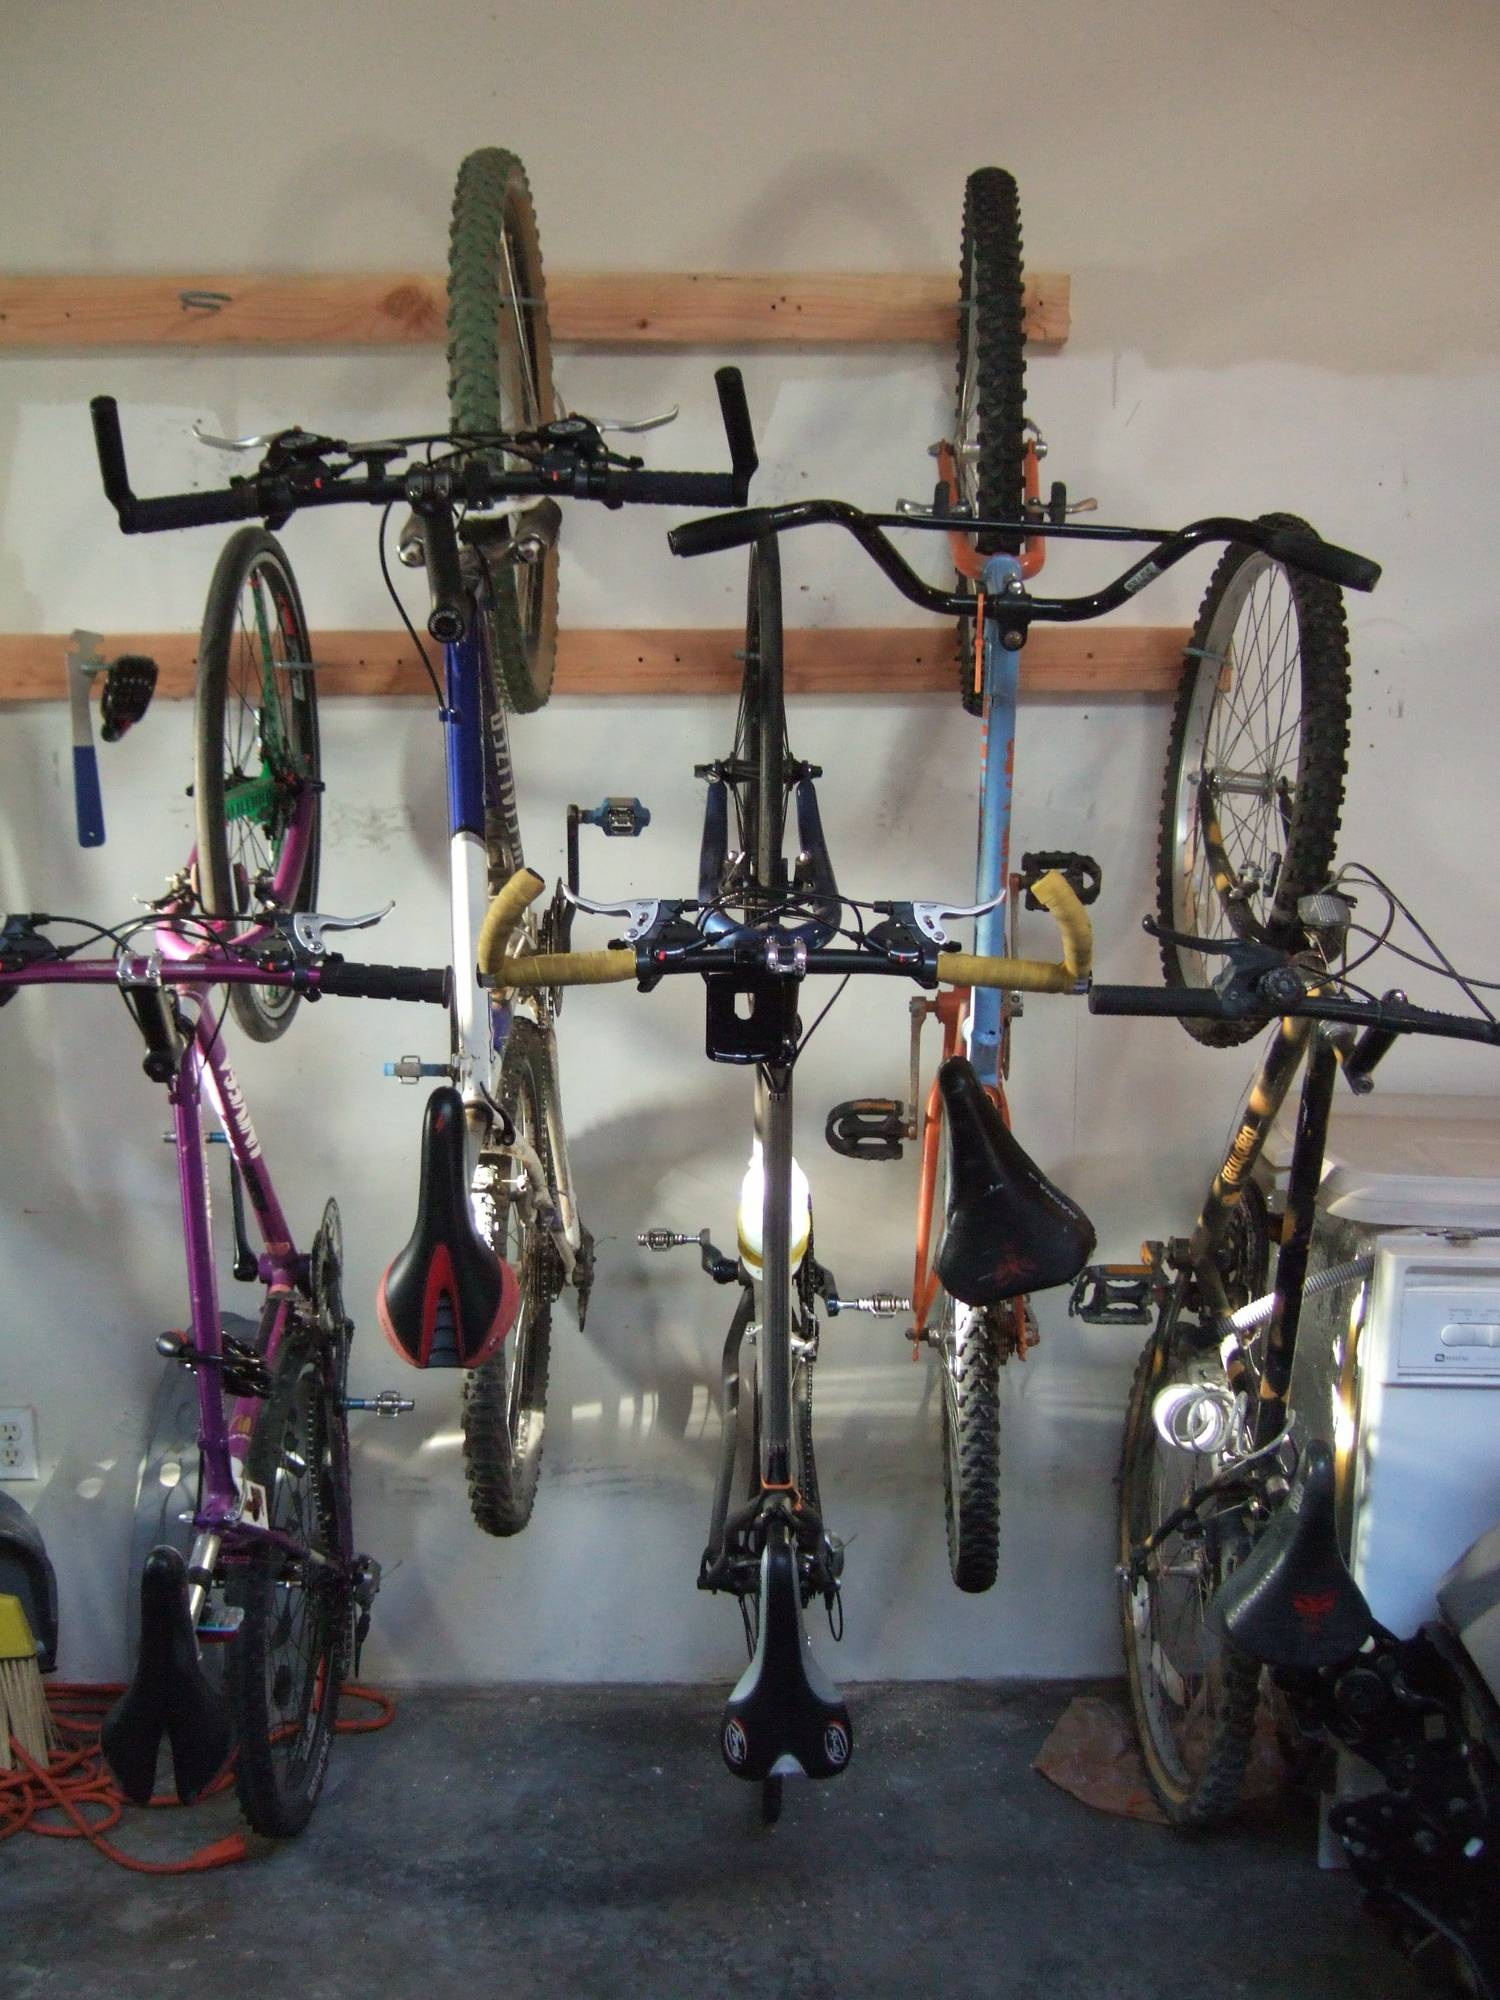 Bike Rack / Bike Storage for the Home or Apartment